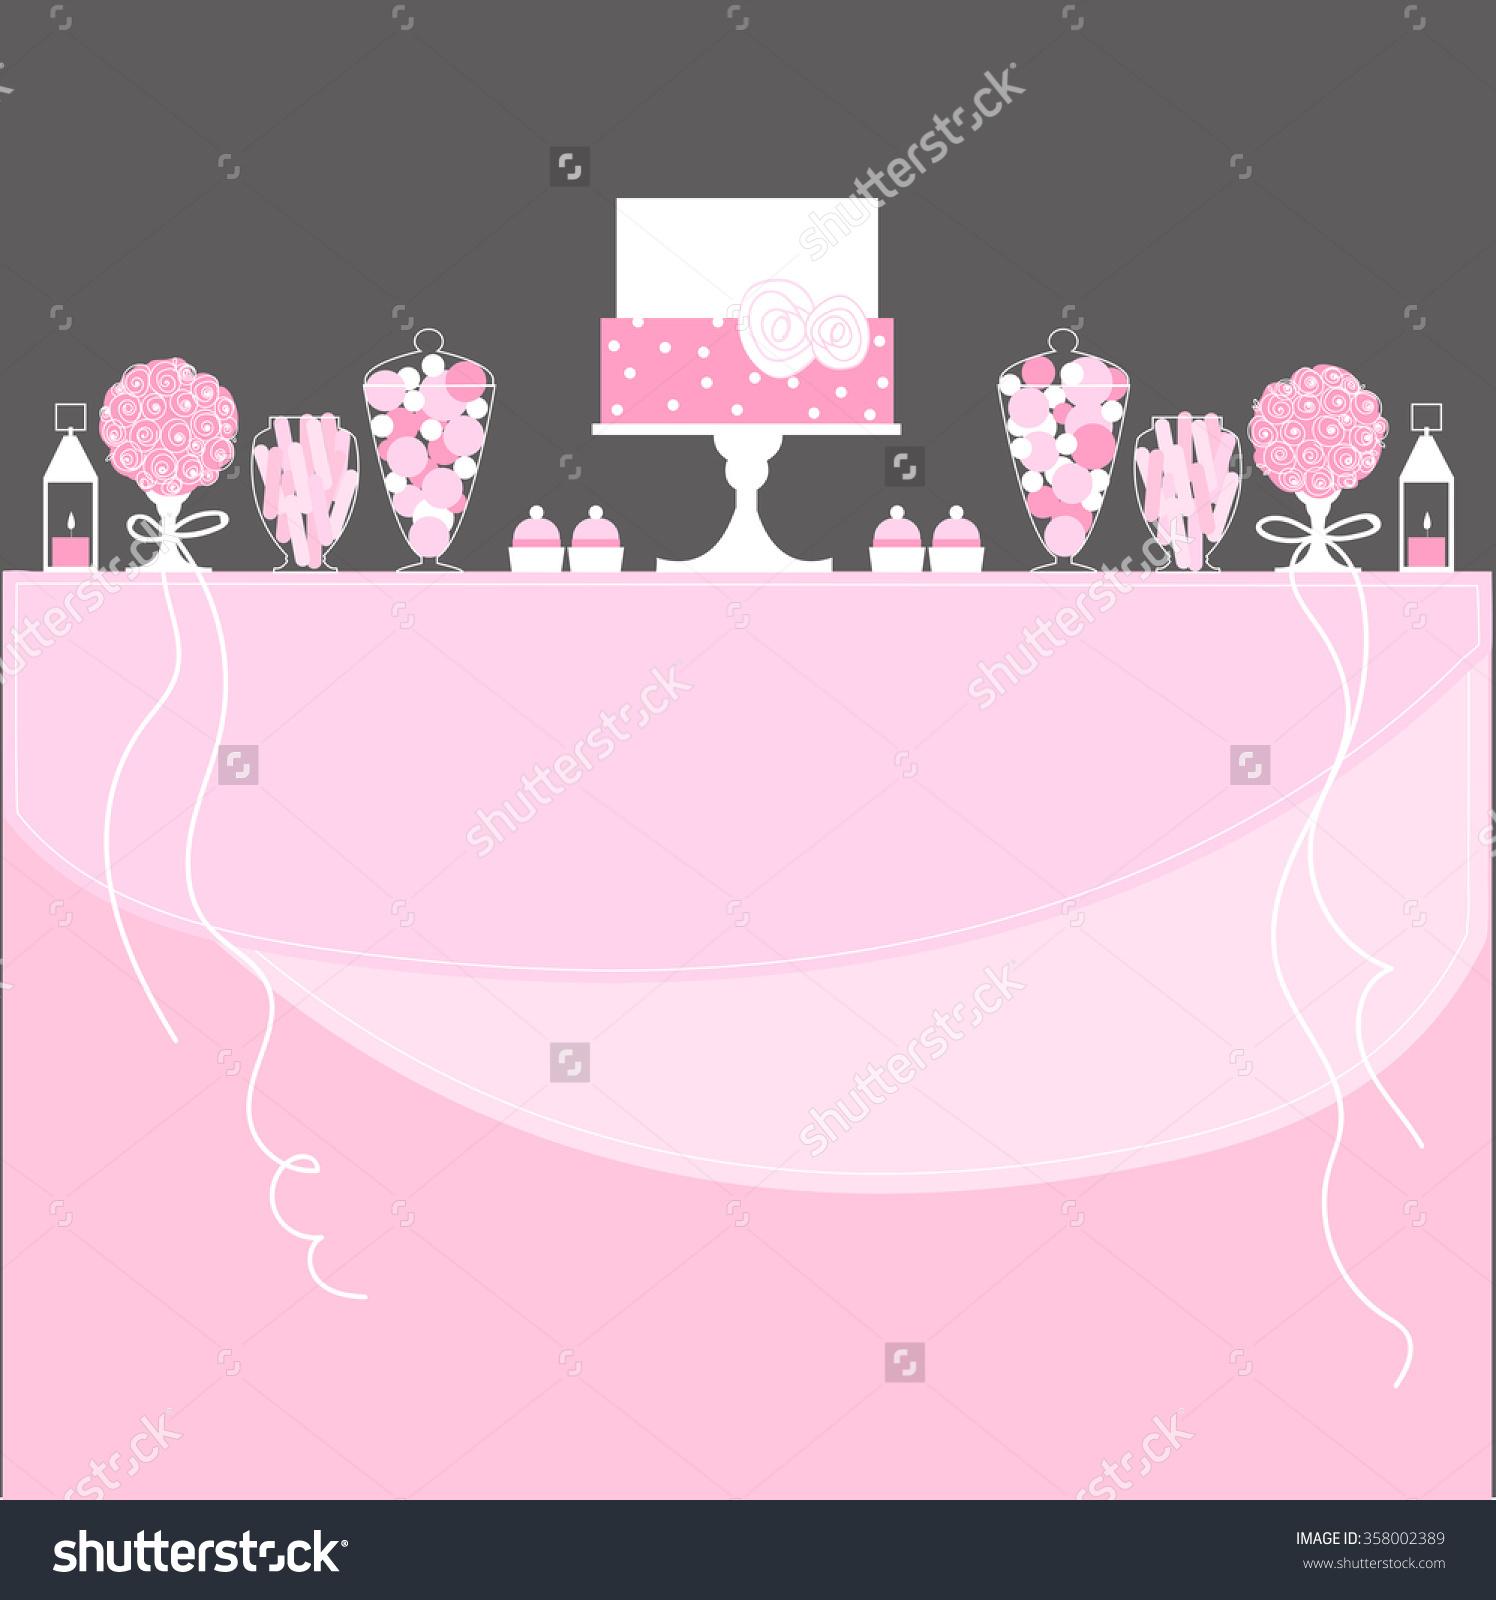 Candy Buffet Cake Lanterns Flowers Wedding Stock Vector 358002389.